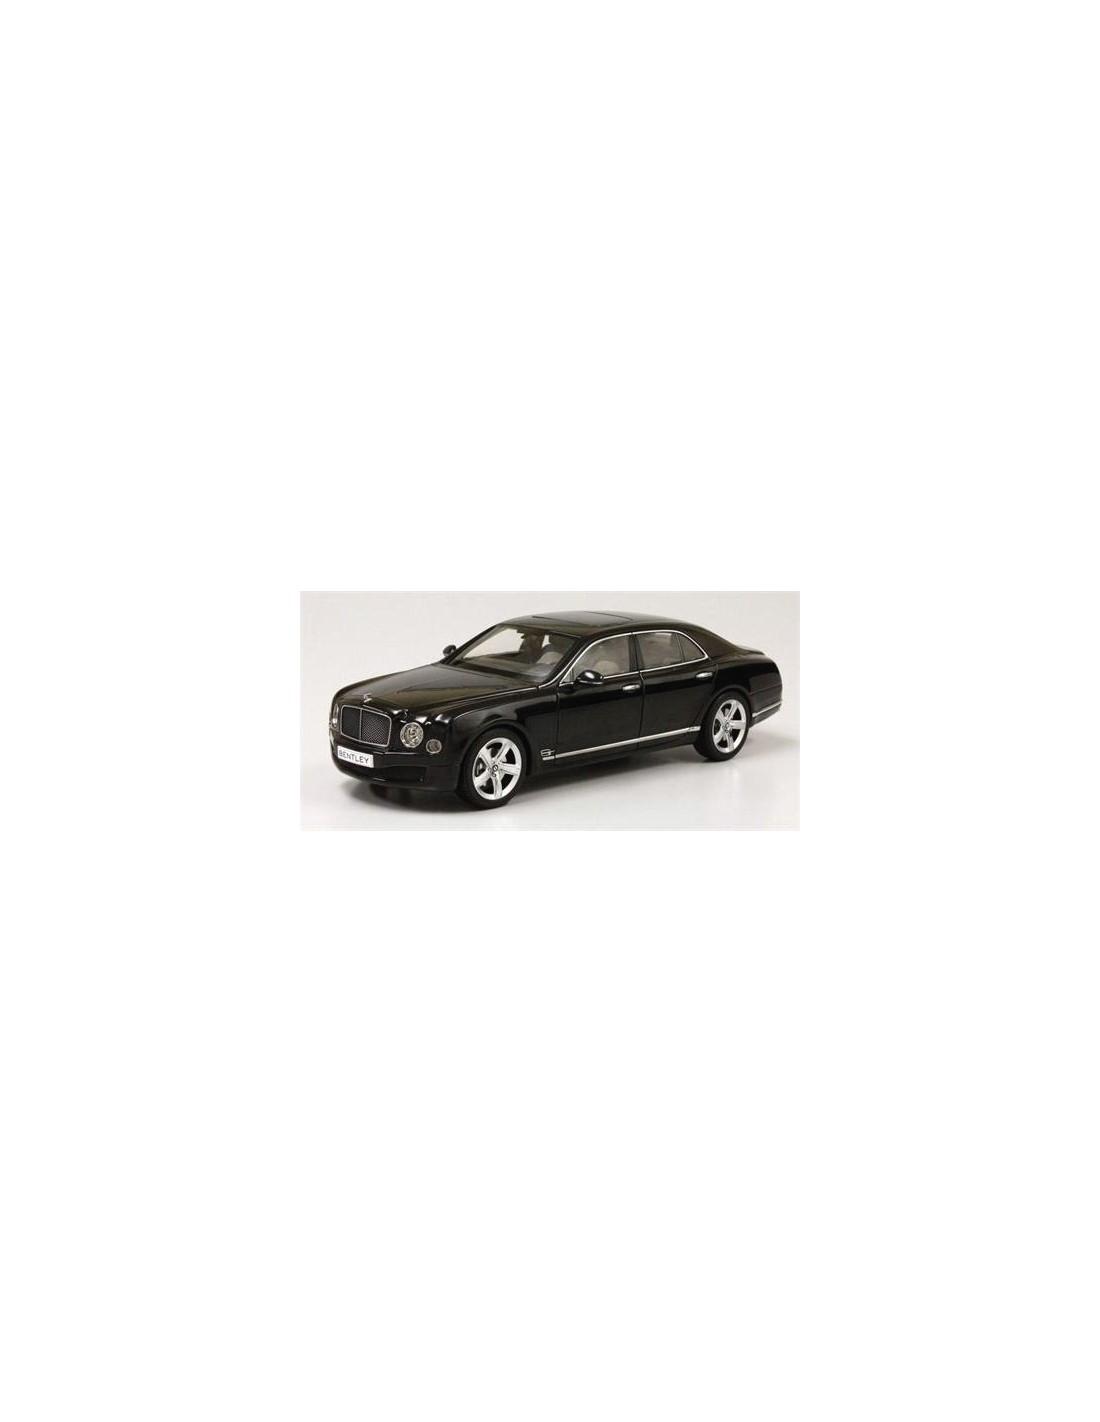 2012 Bentley Flying Spur W12 Diamond Black: Kyosho Bentley Mulsanne Speed 2014 Onyx Black